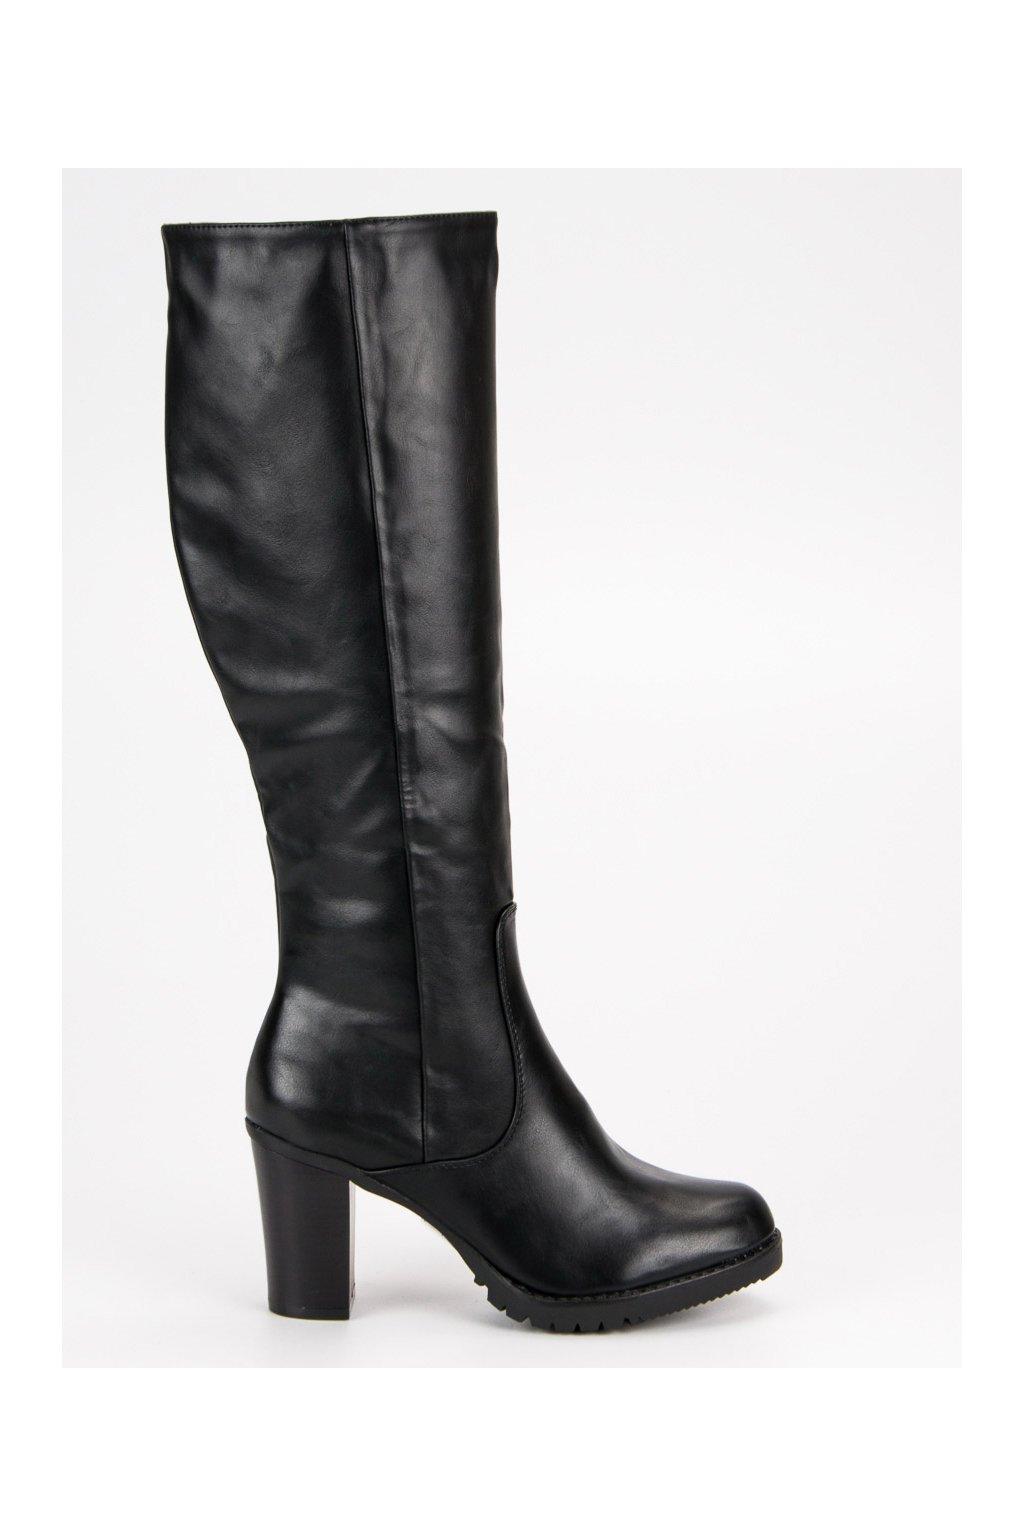 Klasické dámske čižmy čierne HX19-16029B b88d0e7527d